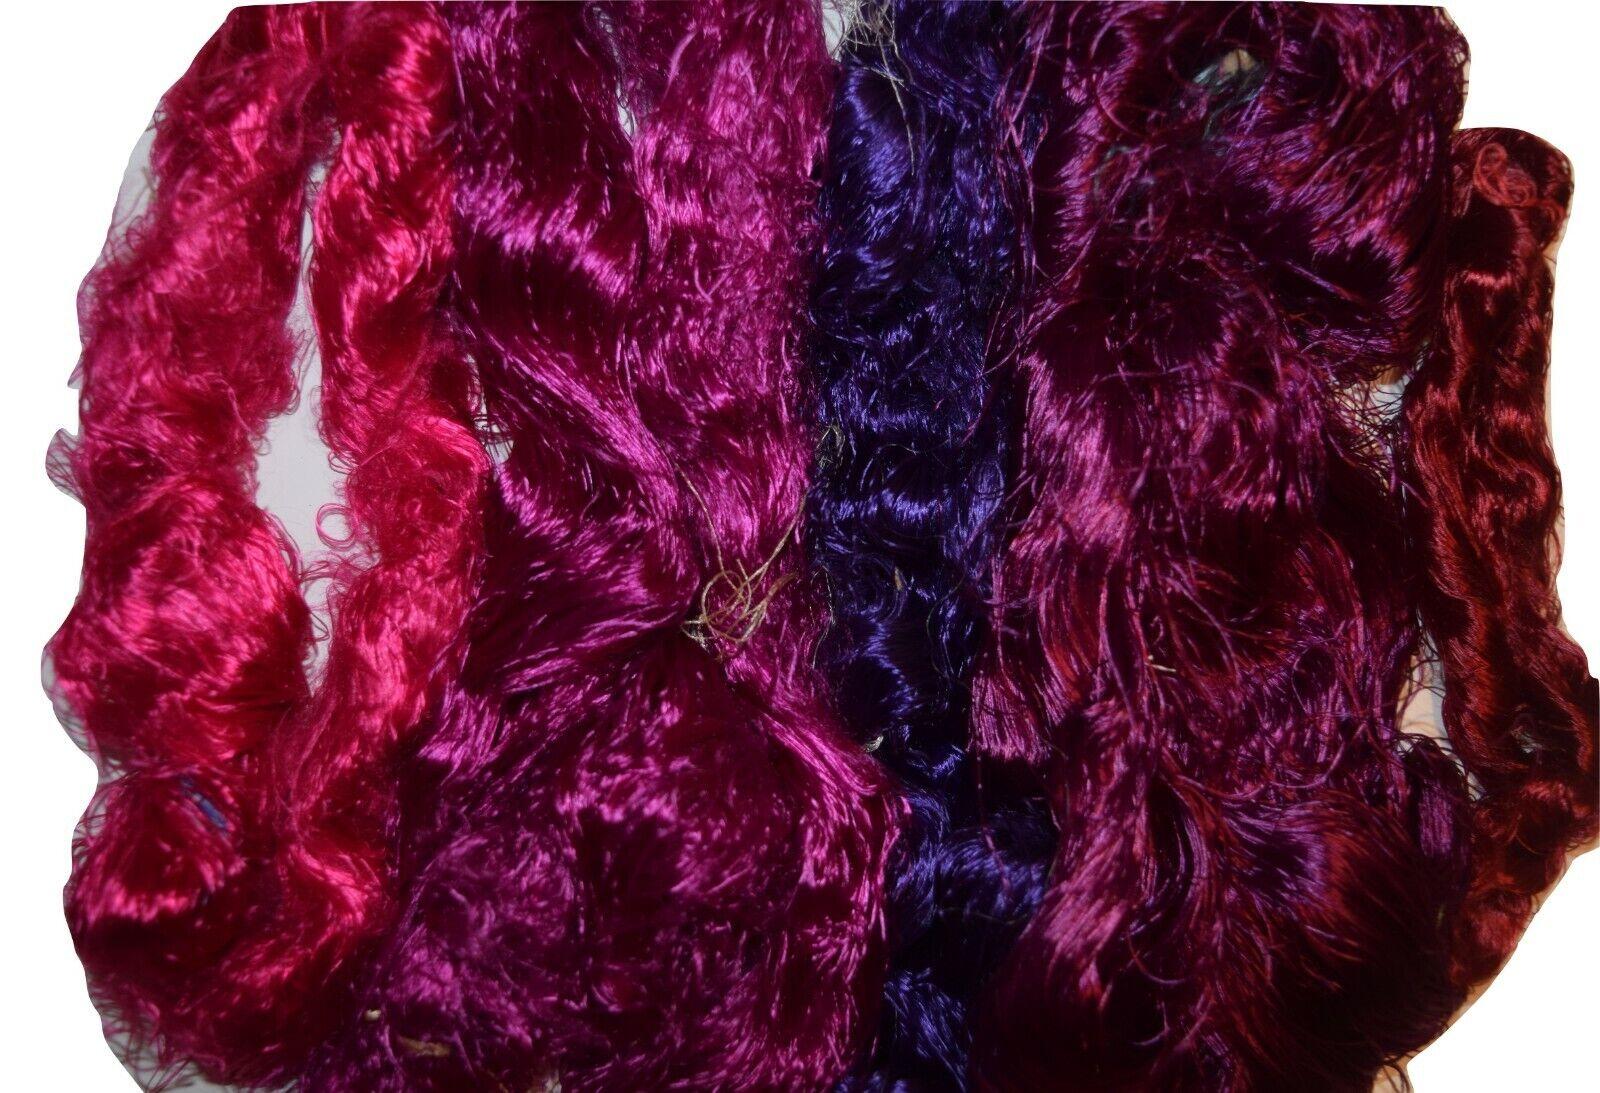 800g Pure Eri Peace Assam Waste silk Fiber Handmade Spinning Felting Crafting